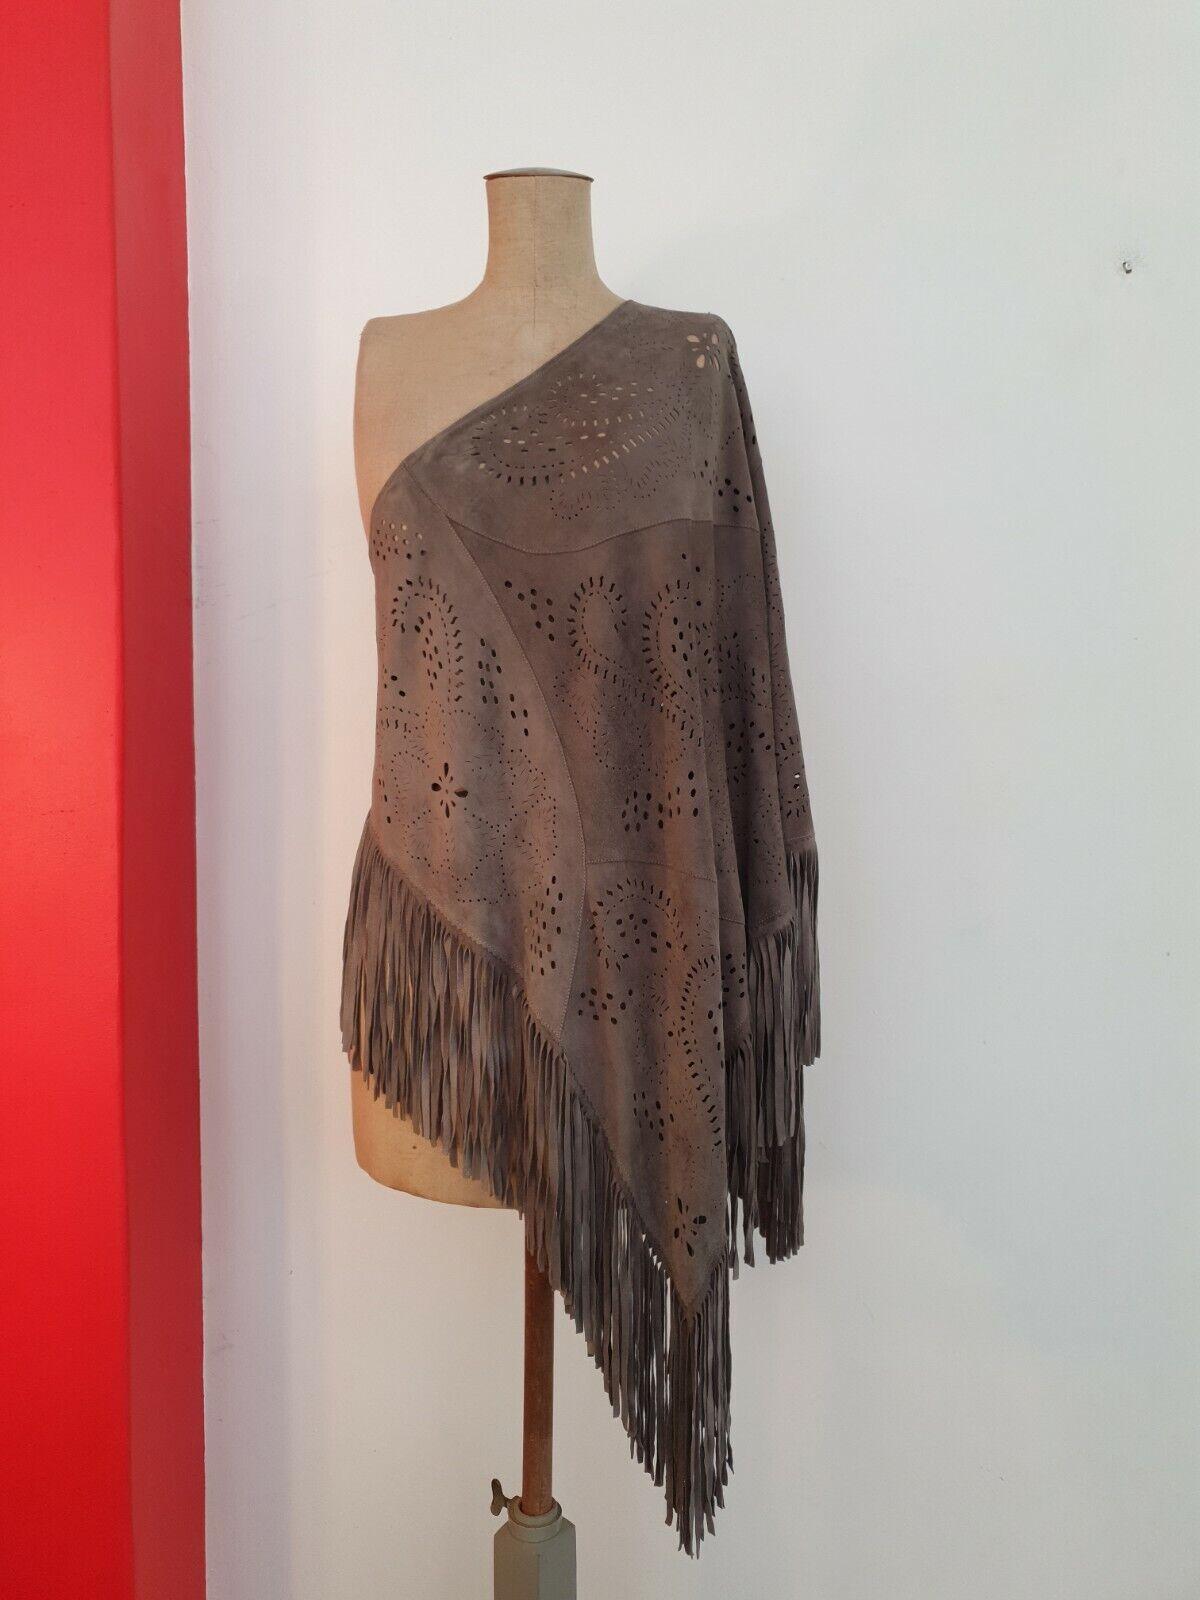 Suede Leather Poncho Cape Pullover Boho Hippie Gypsy RARITY OSFA